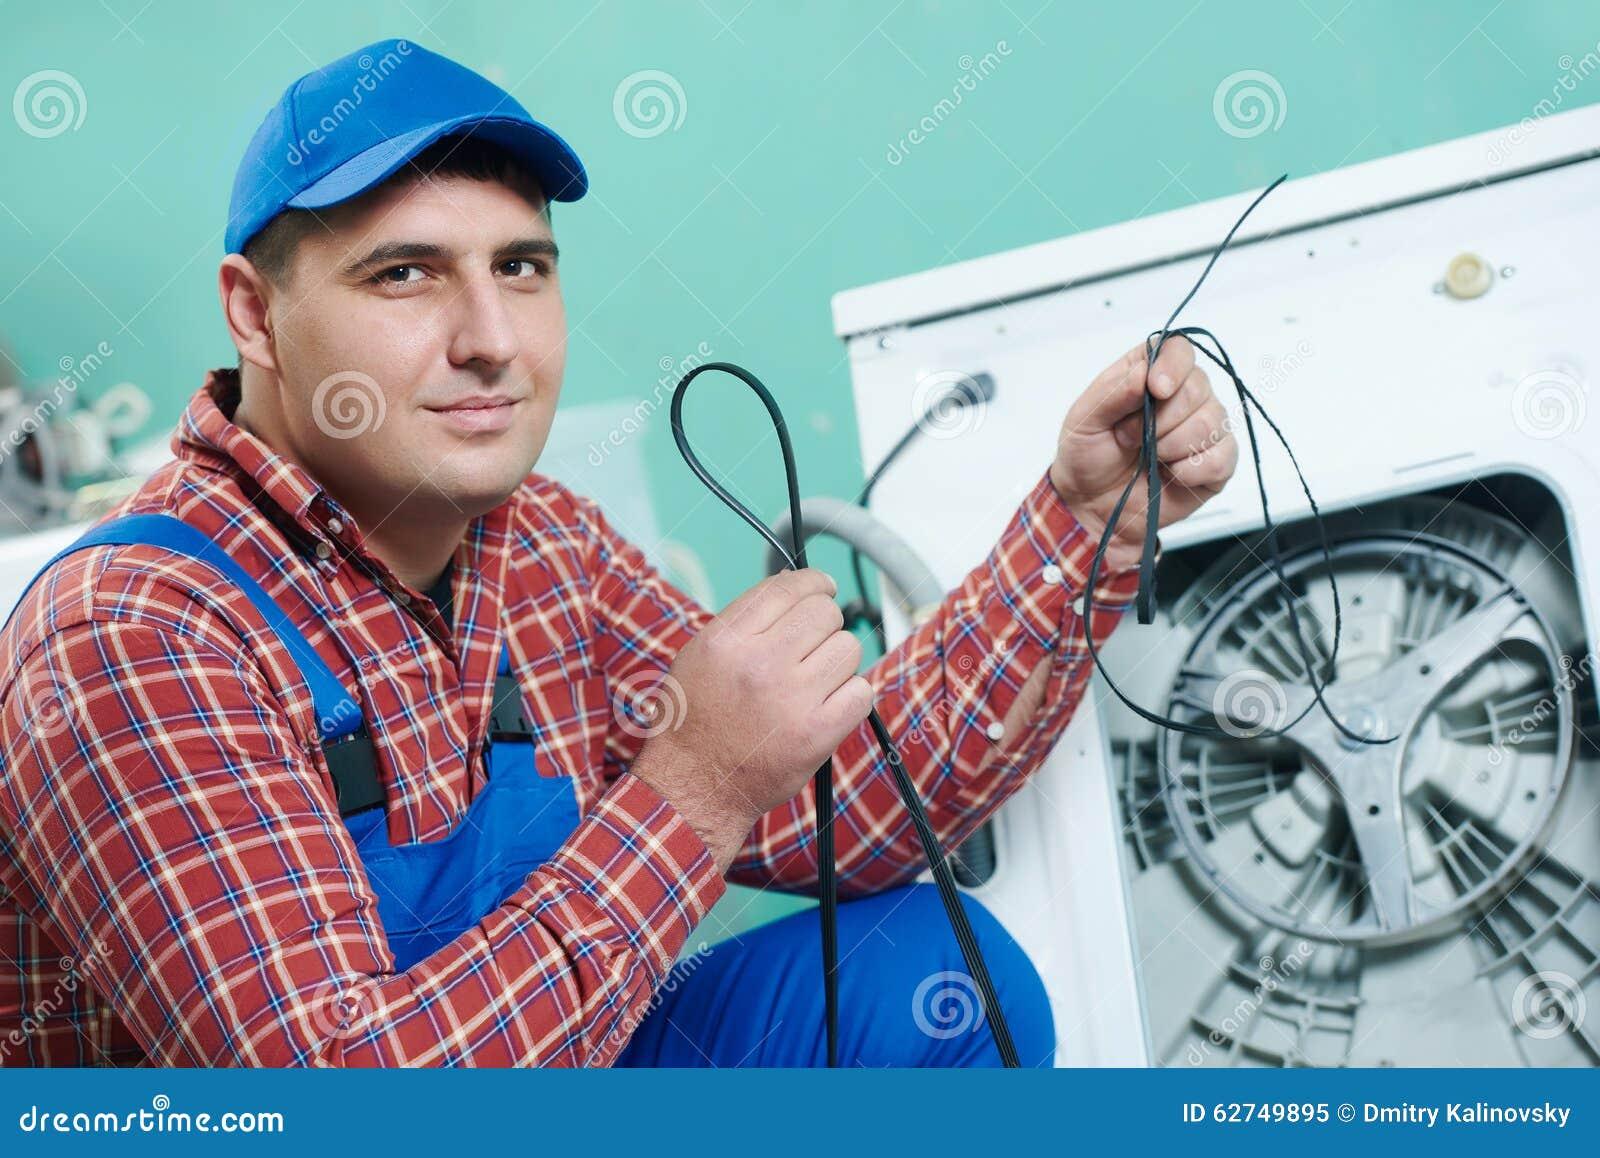 Replacing rubber drive belt of washing machine